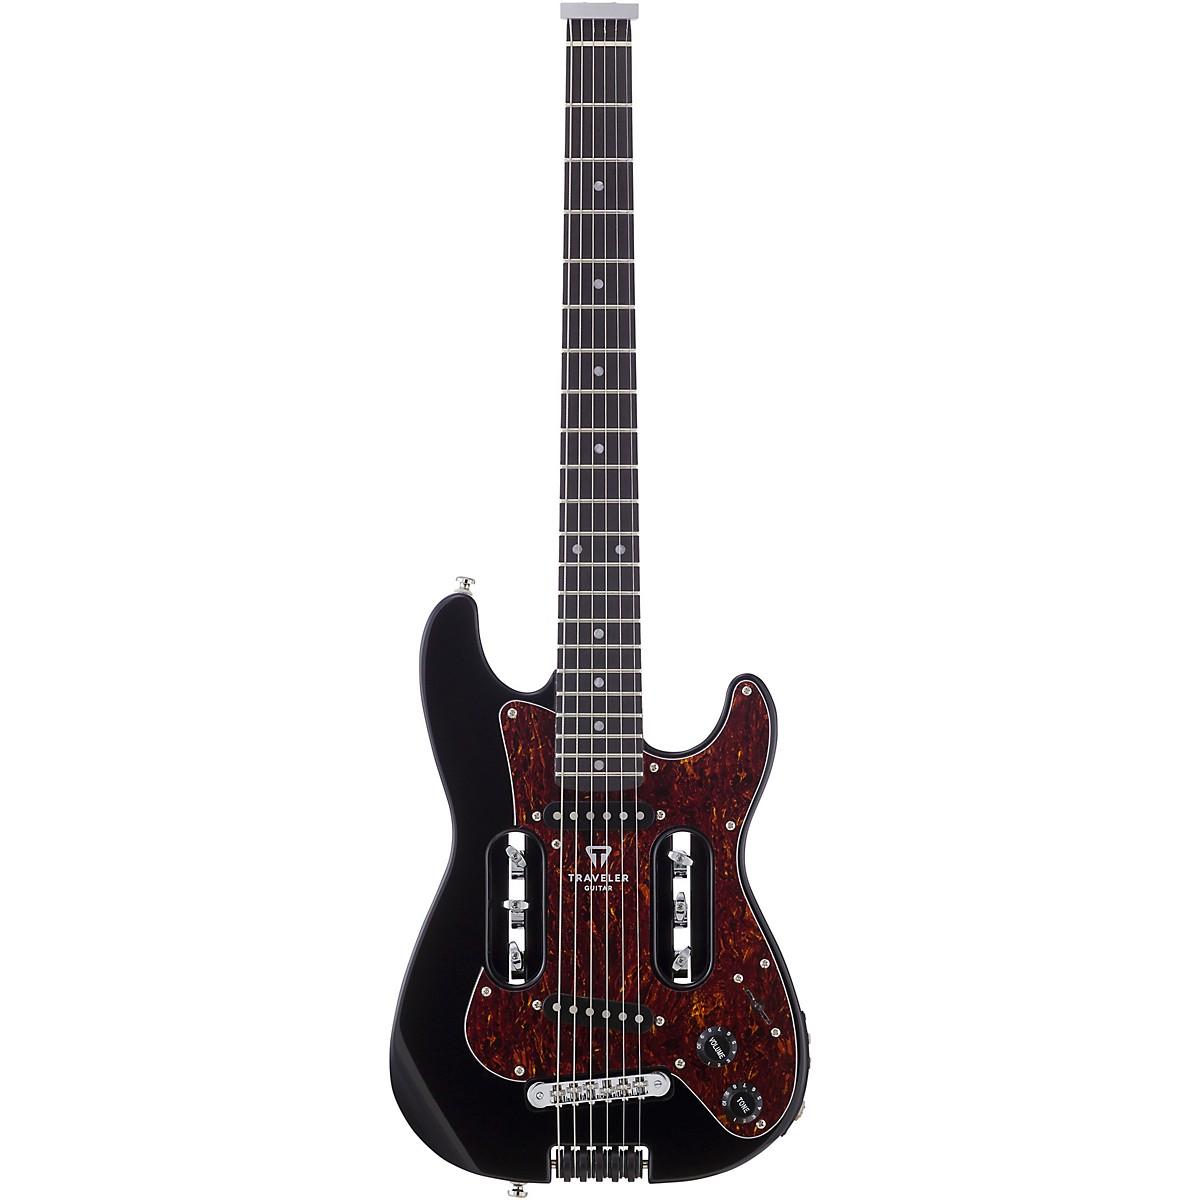 Traveler Guitar EG-2 Standard Electric Travel Guitar with Deluxe Gig Bag